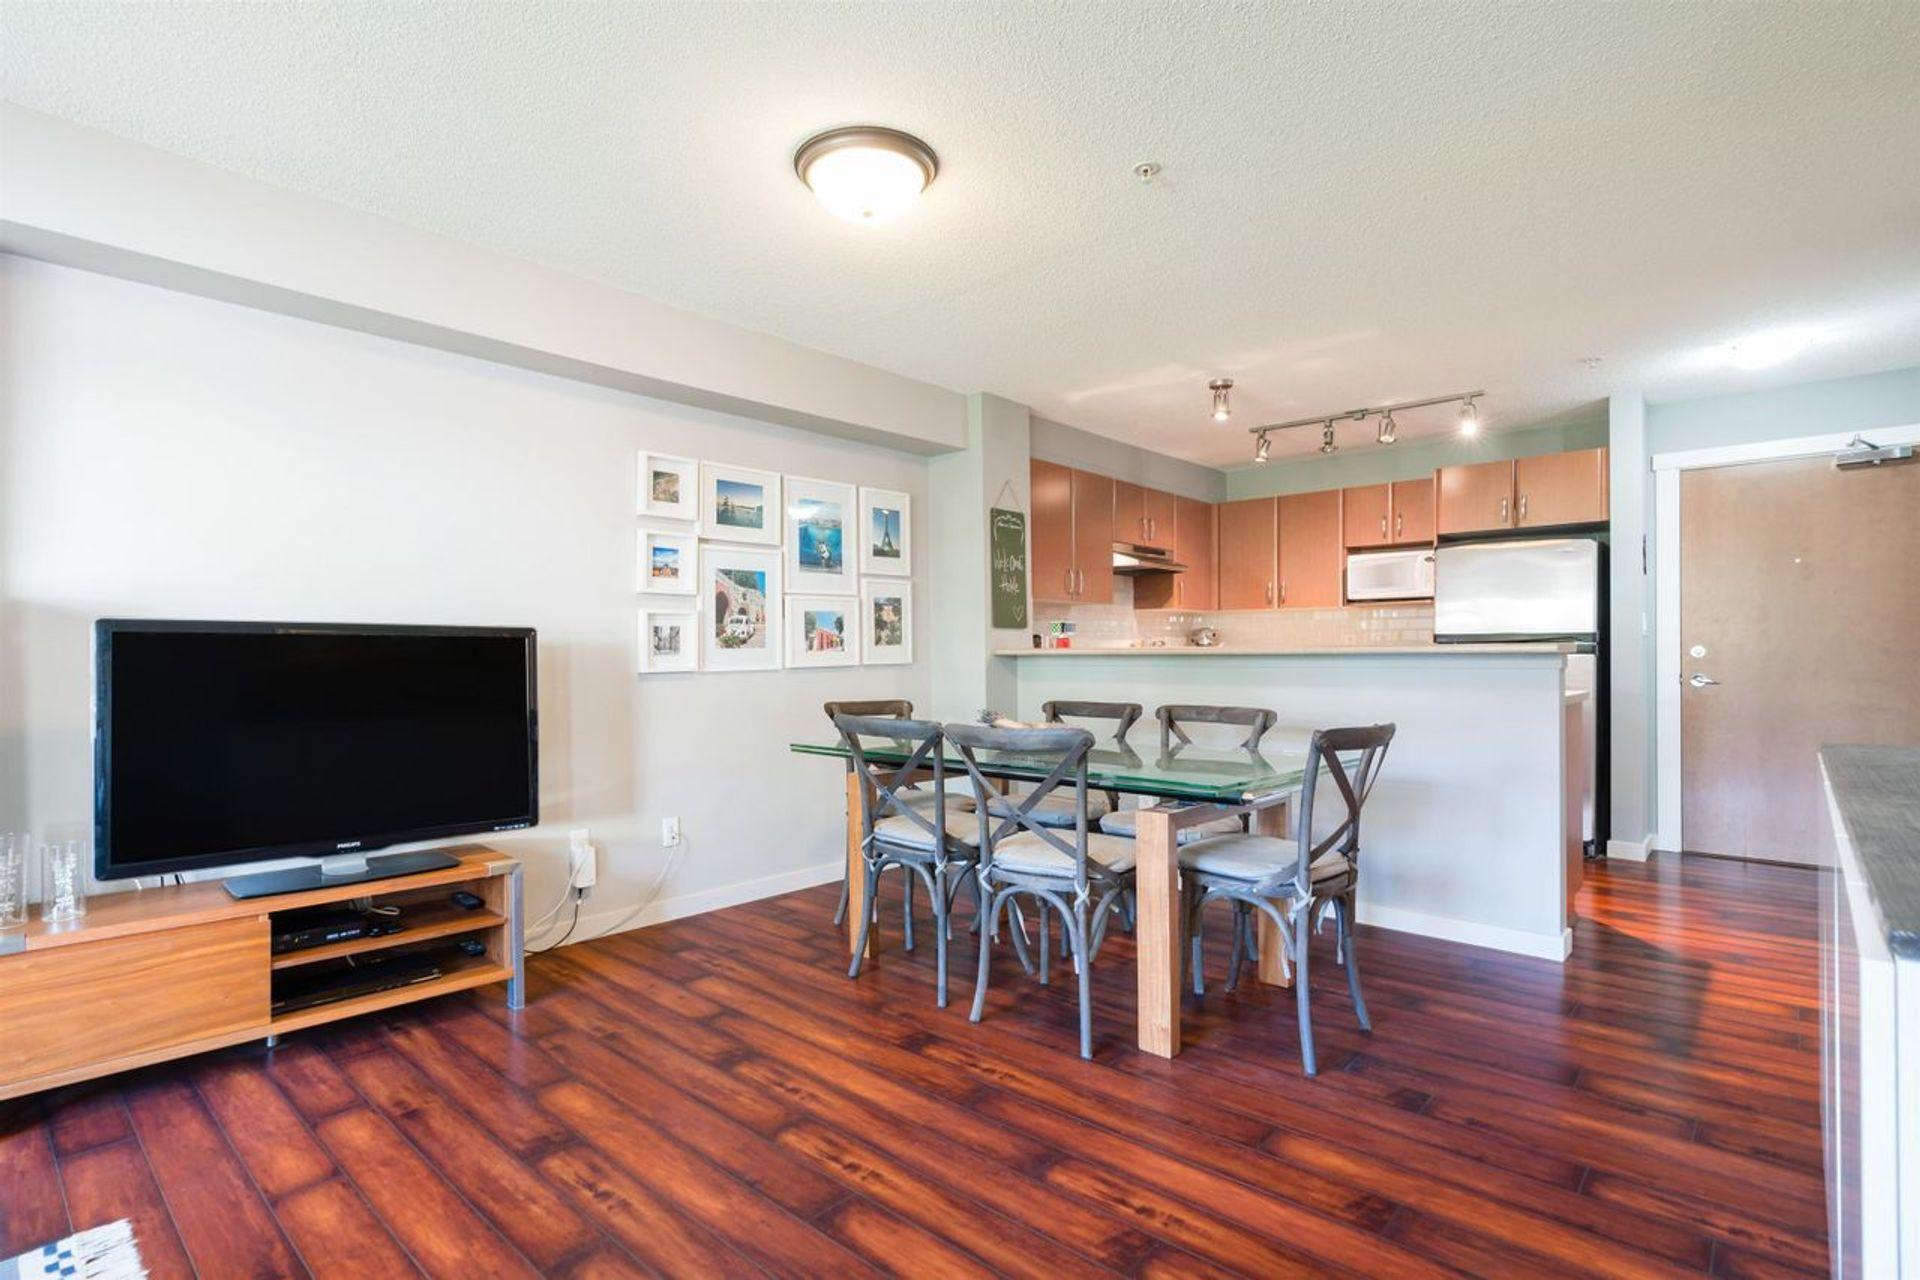 4723-dawson-street-brentwood-park-burnaby-north-09 at 301 - 4723 Dawson Street, Brentwood Park, Burnaby North